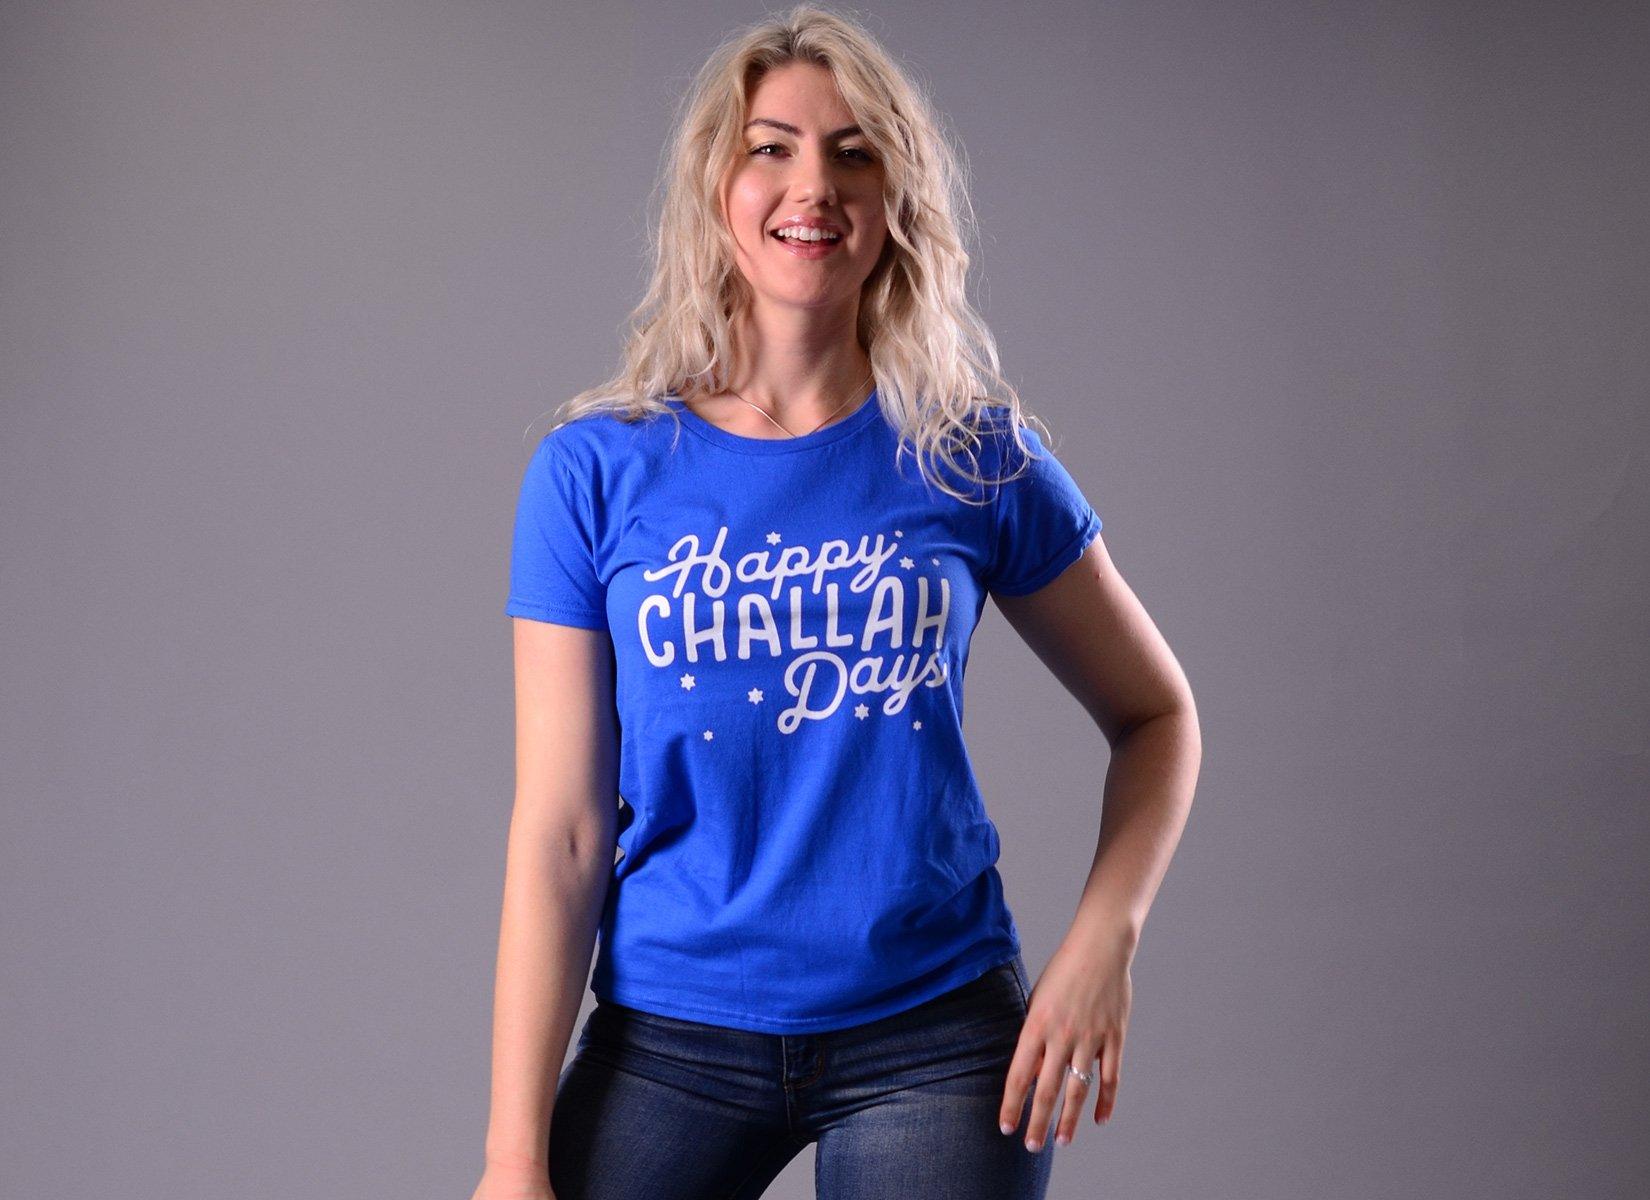 Happy Challah Days on Womens T-Shirt